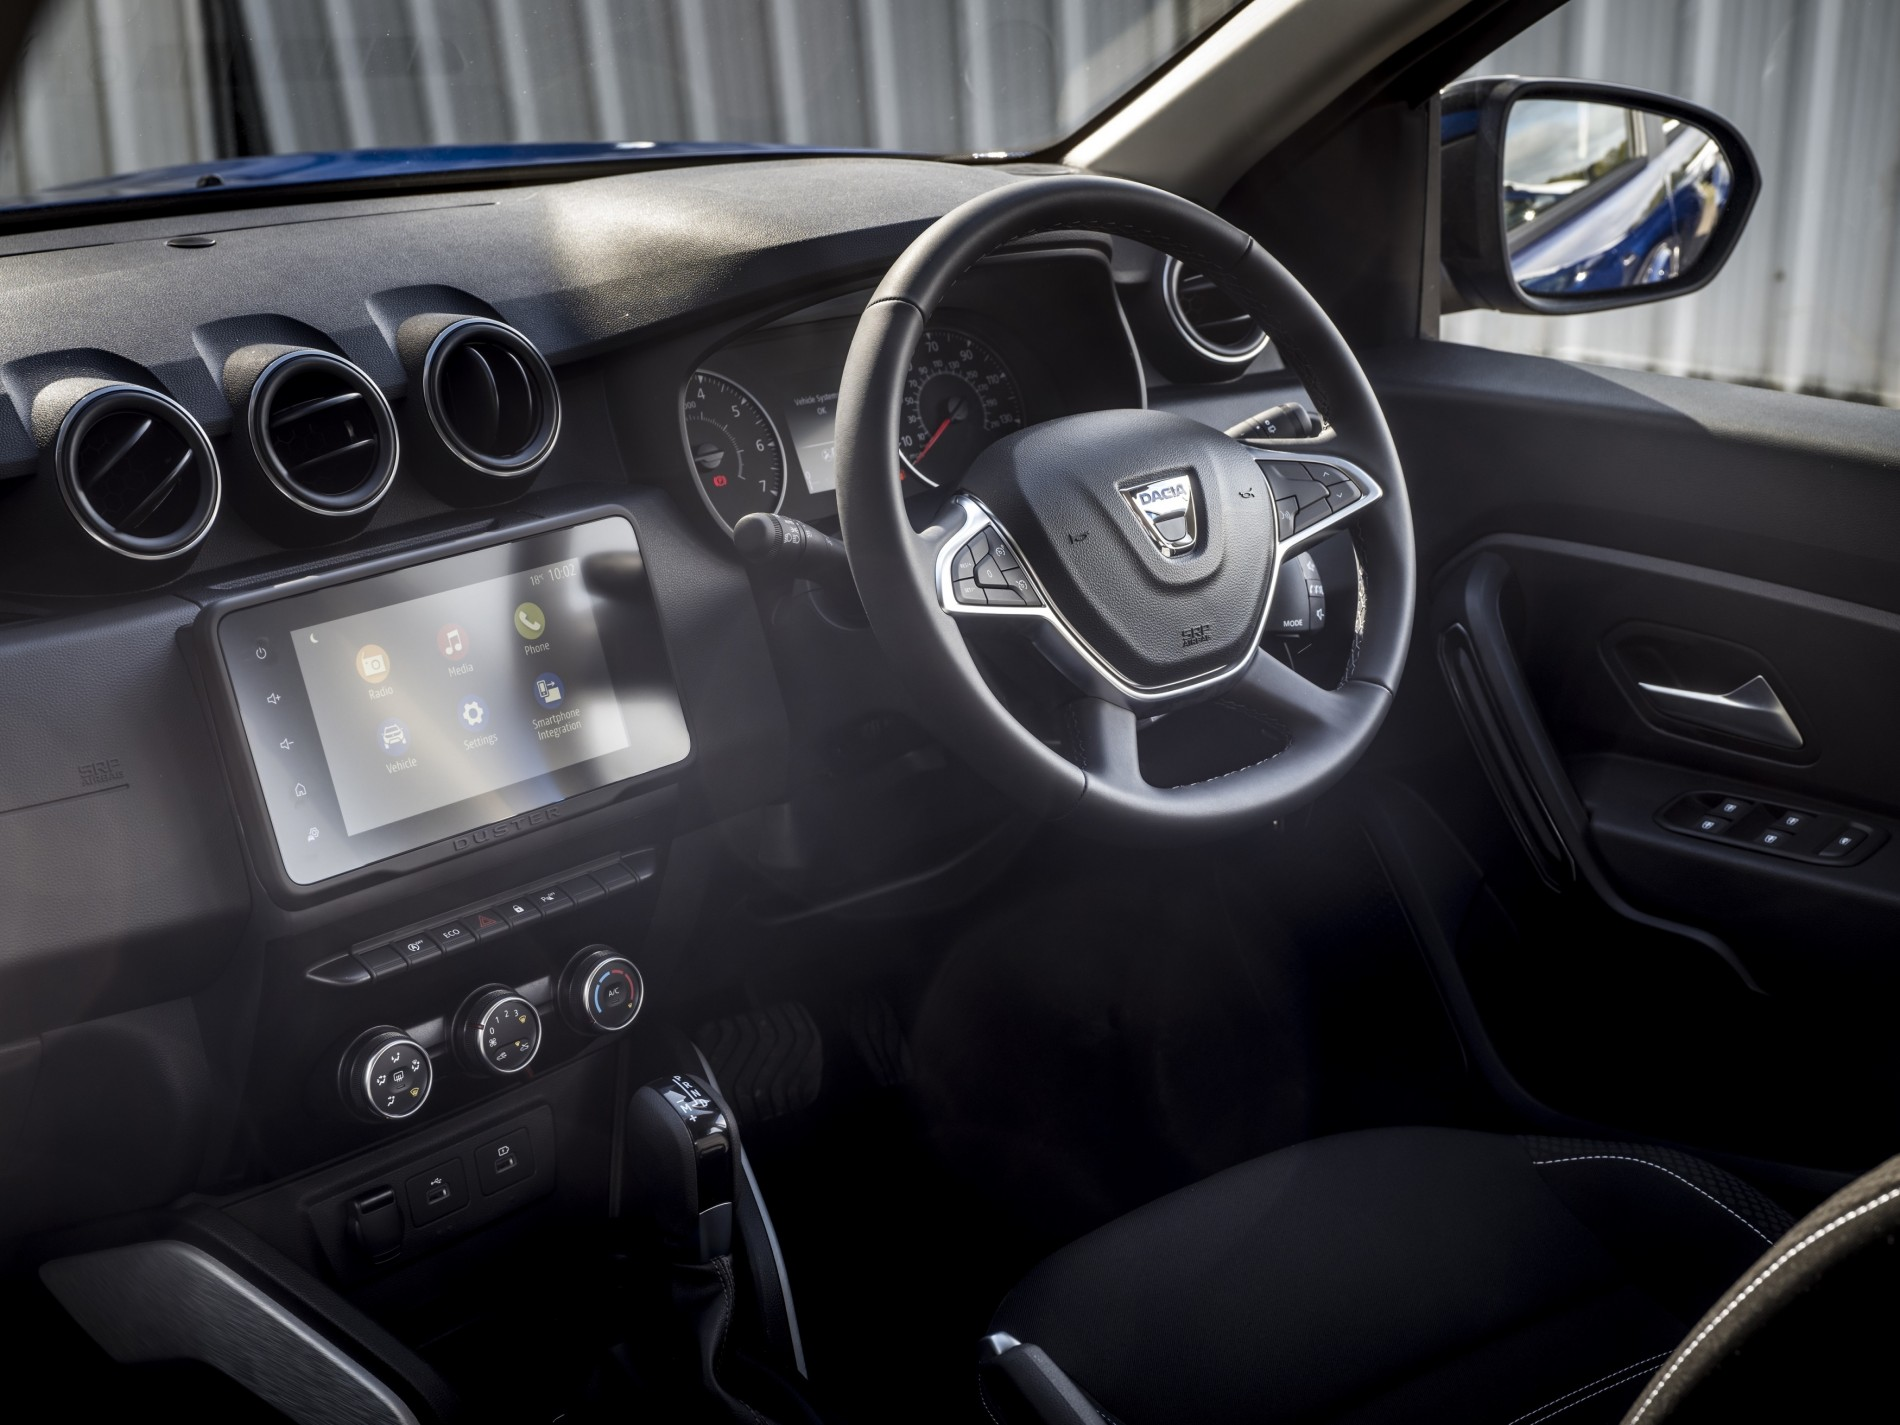 Dacia Duster Commercial - Dacia Duster Commercial